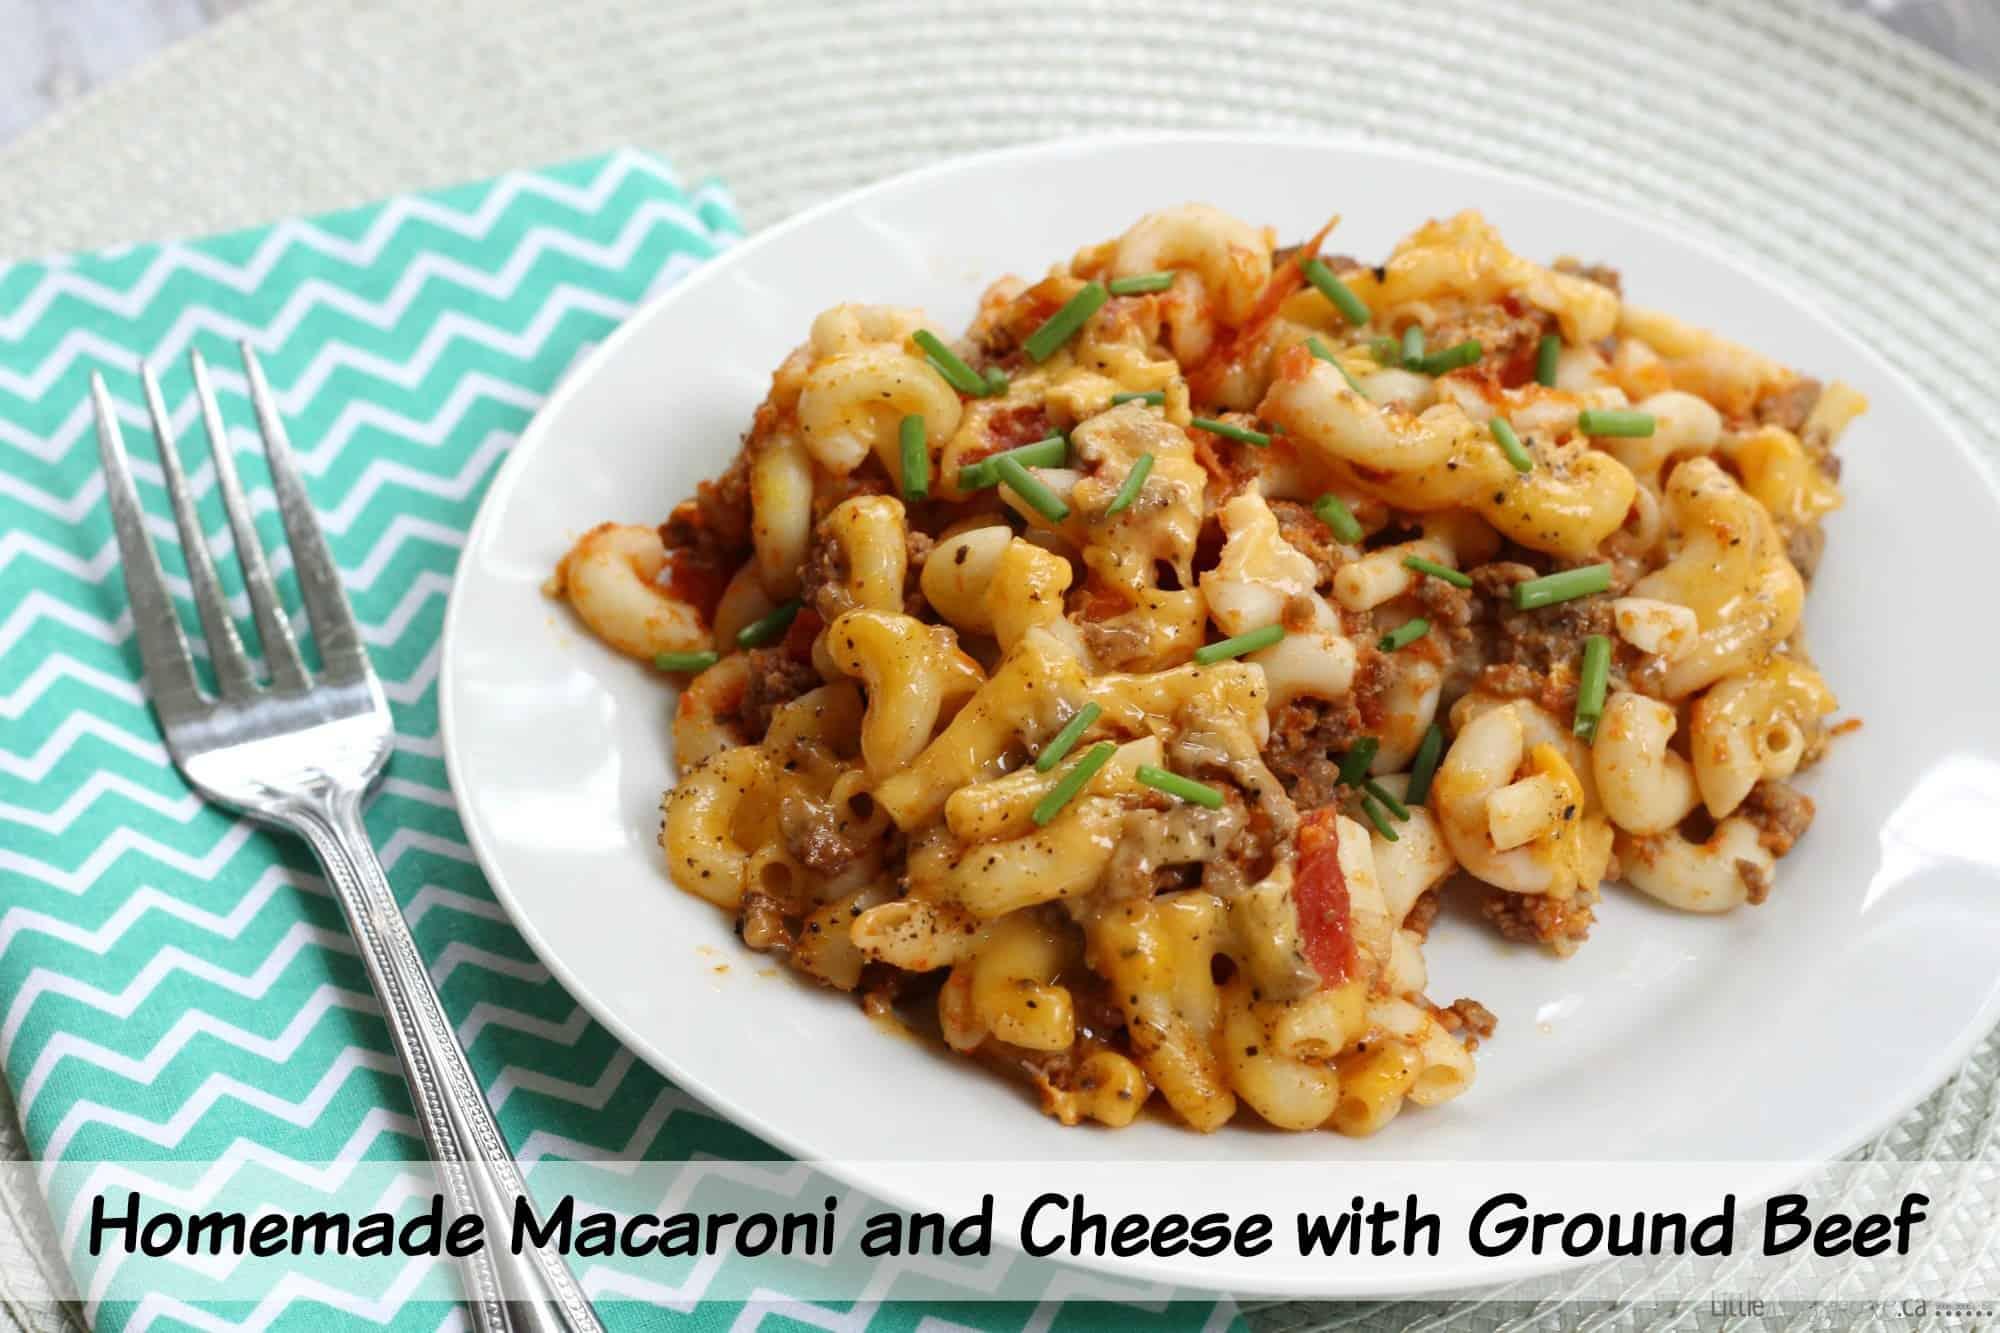 Homemade Macaroni and Cheese with Ground Beef Recipe